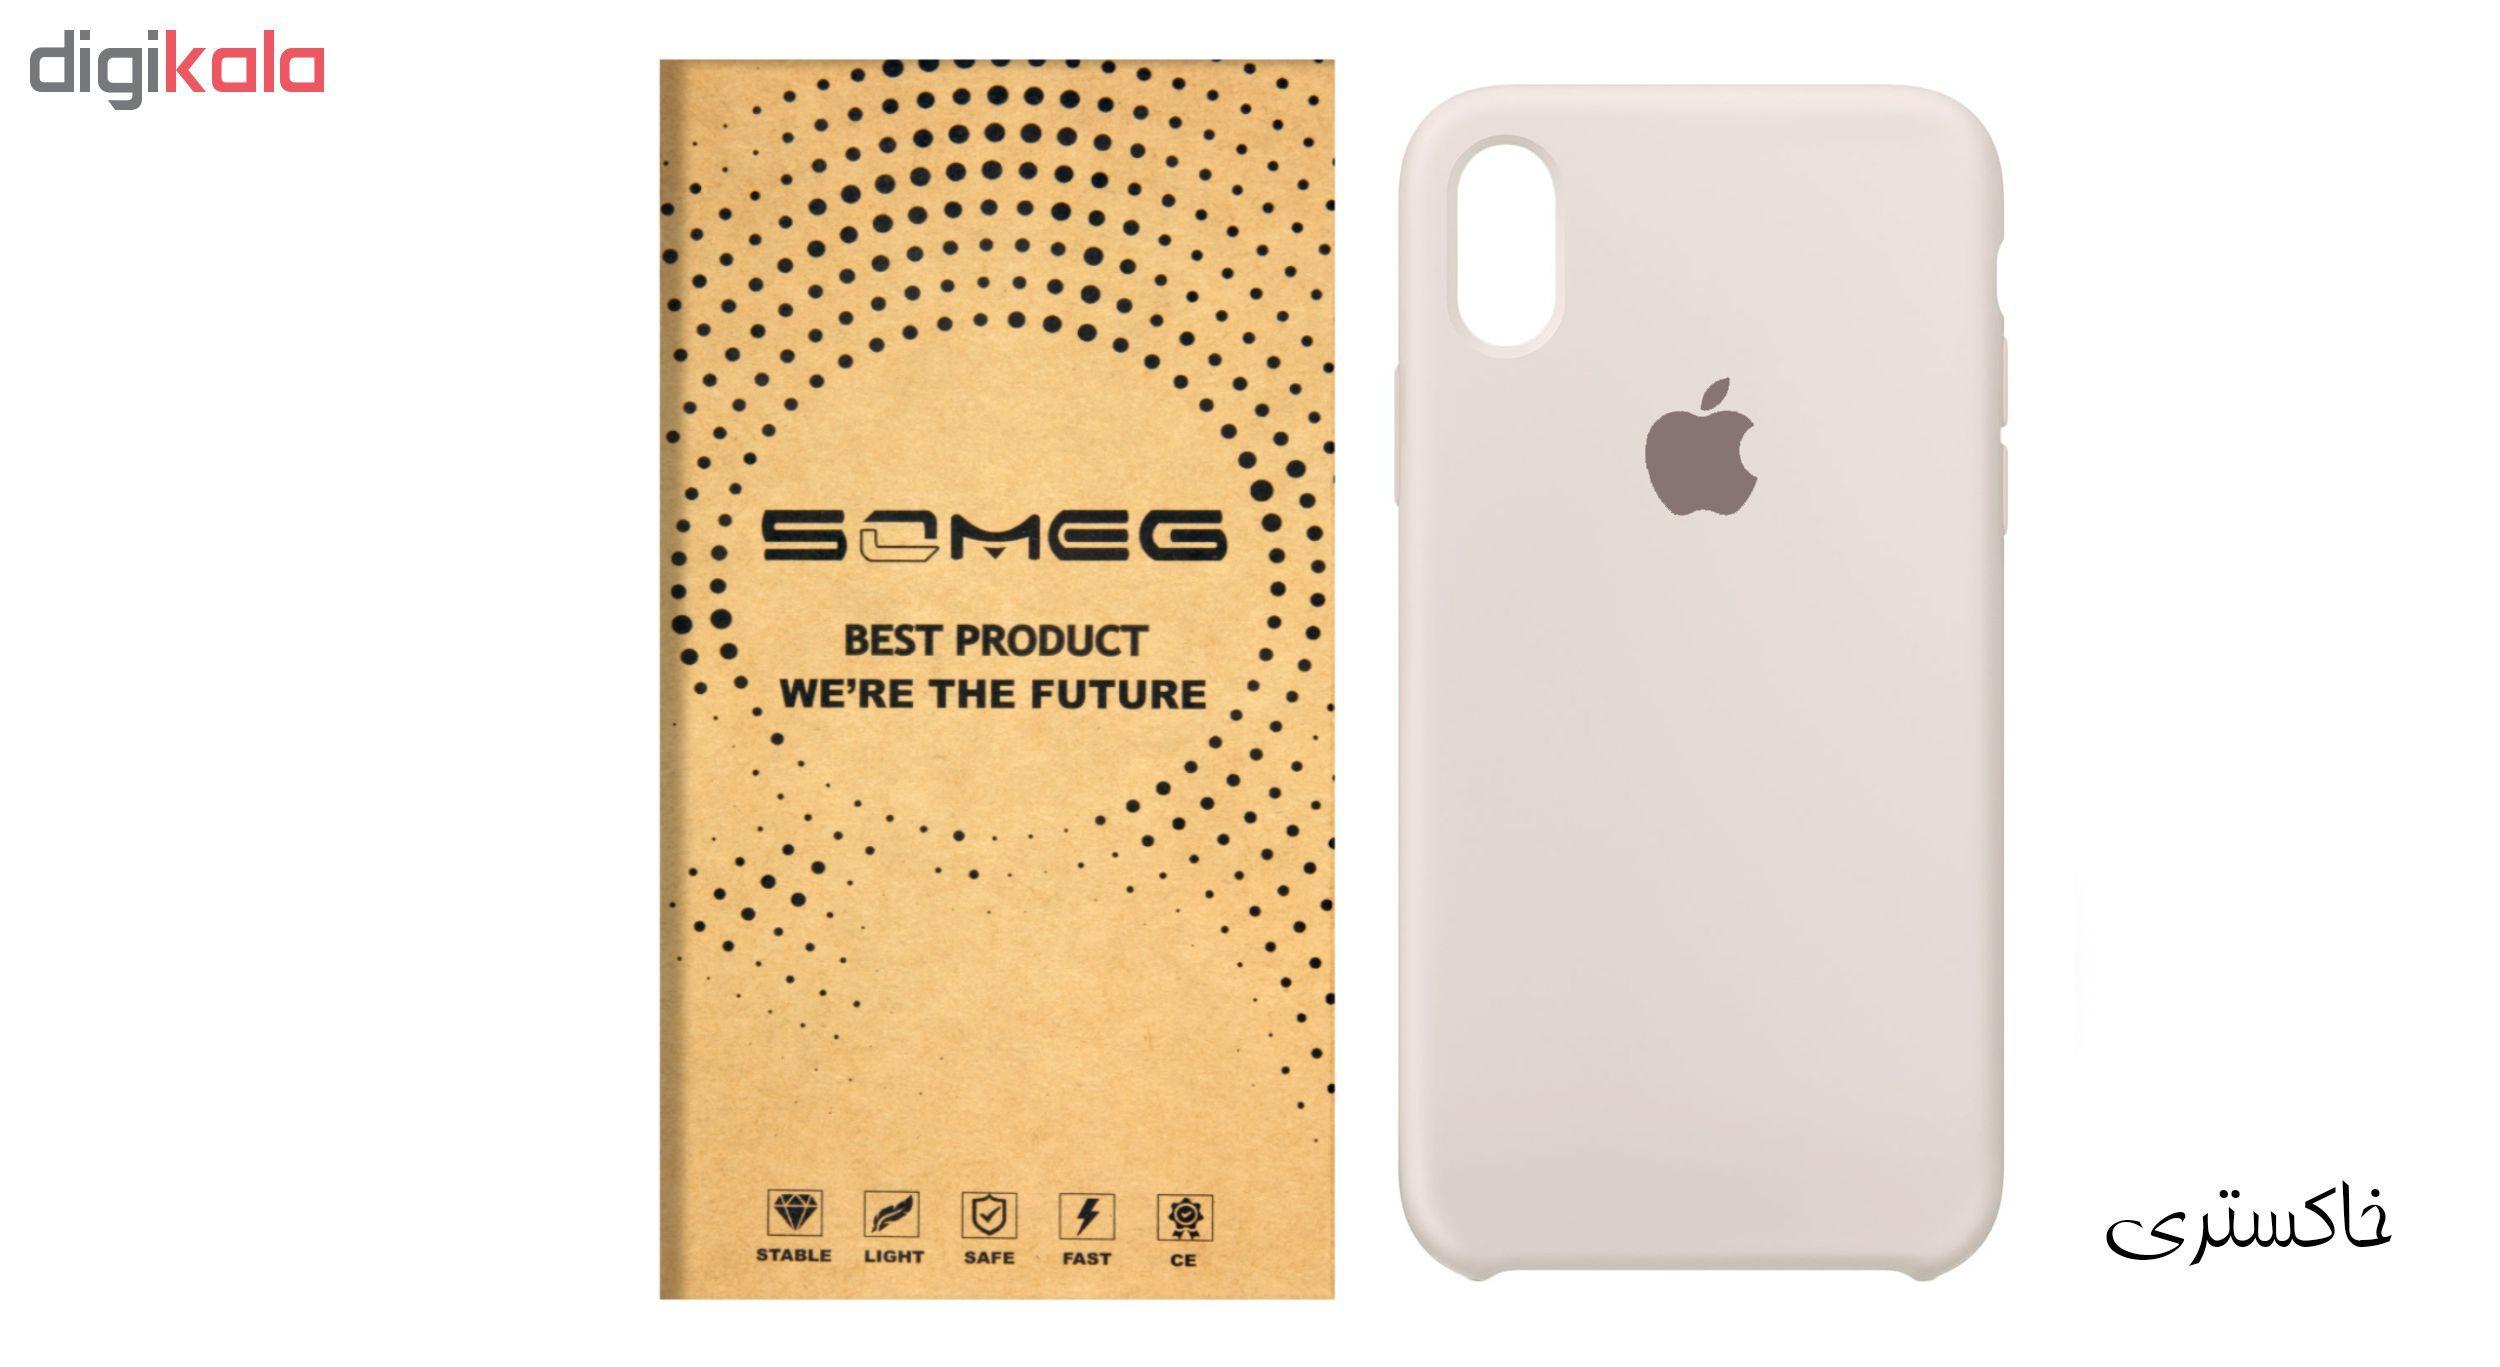 کاور سومگ مدل SIC مناسب برای گوشی موبایل اپل iPhone X  main 1 31